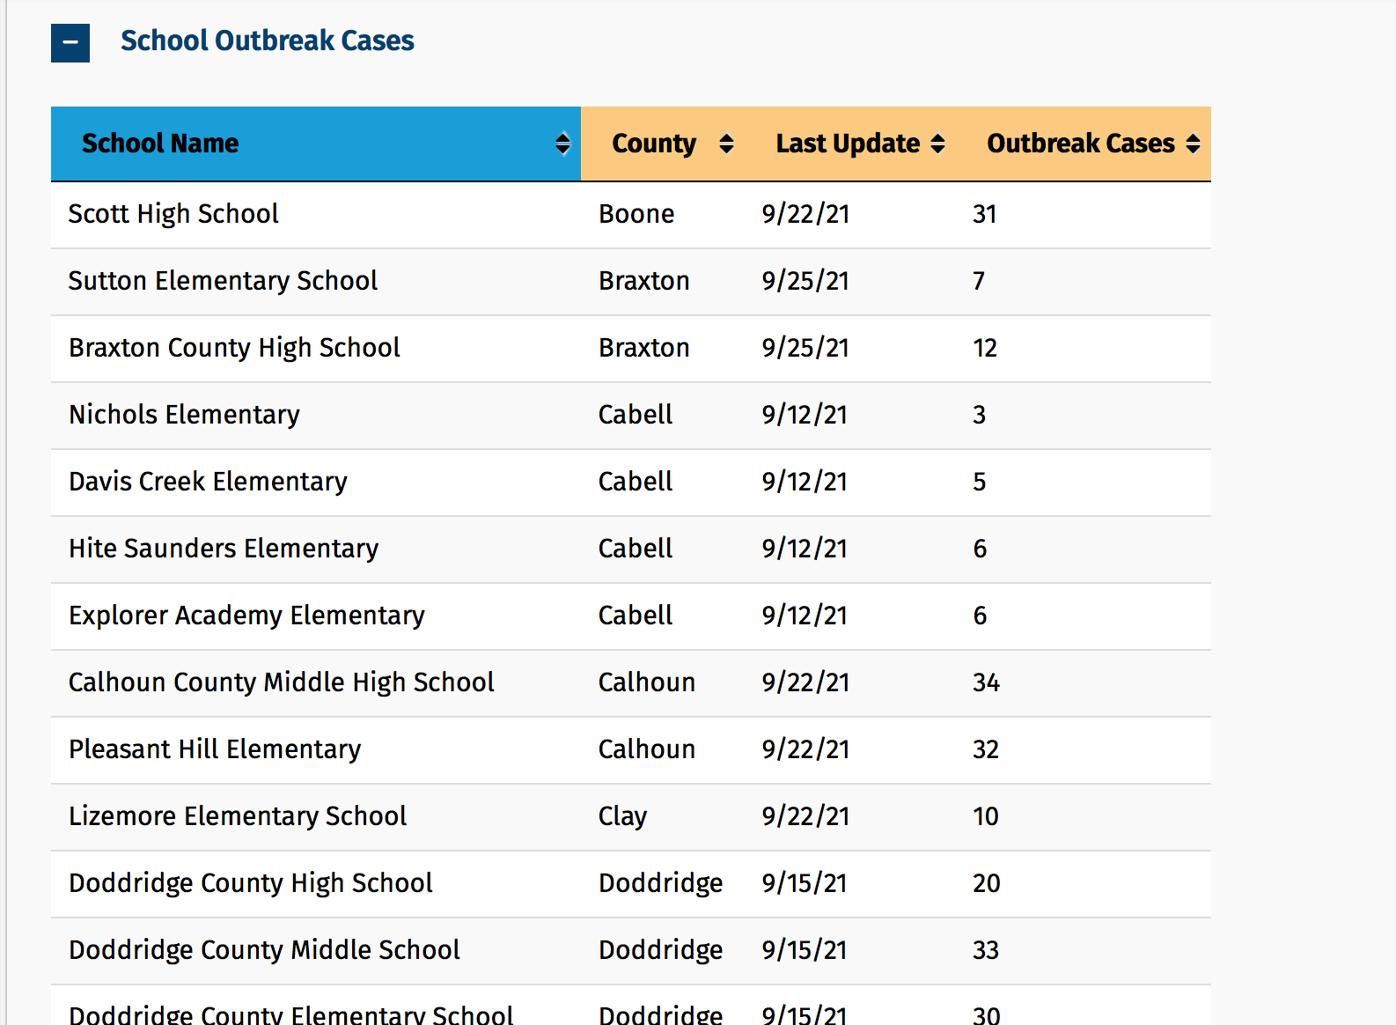 School Outbreak Cases